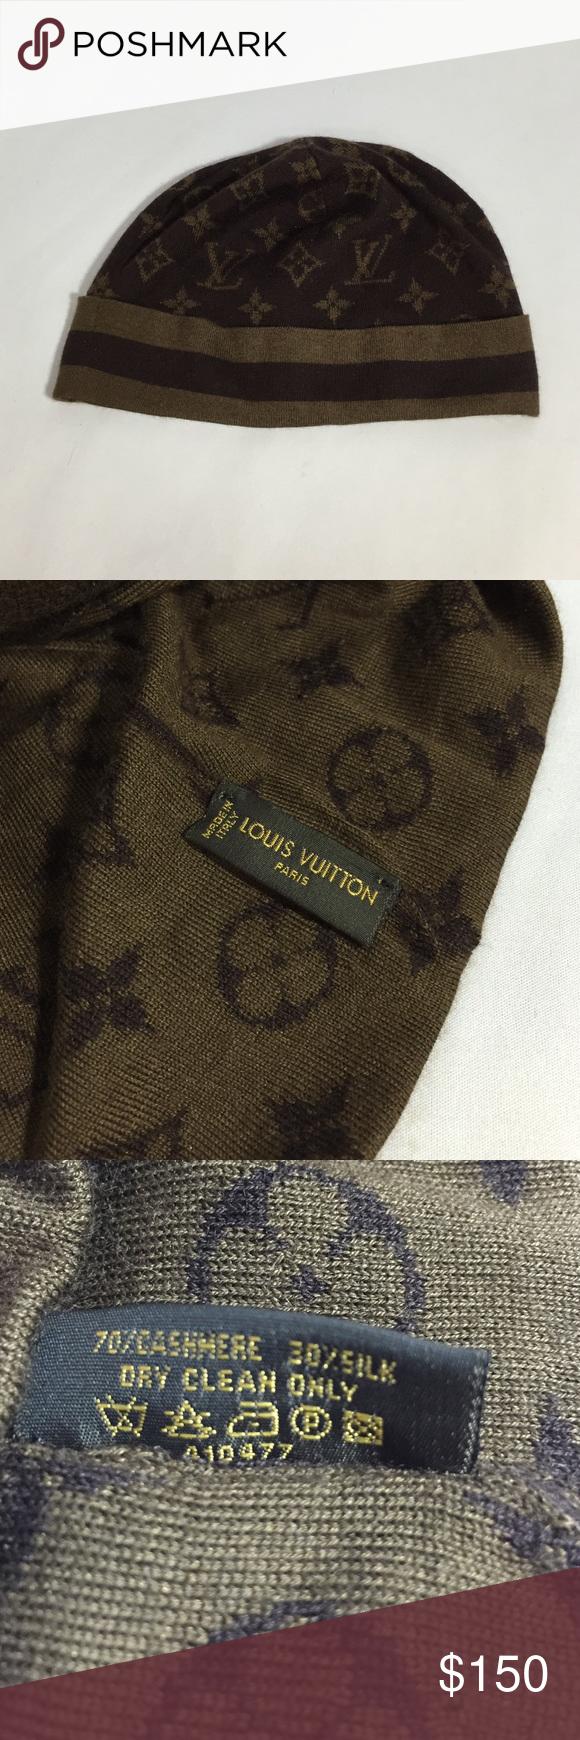 Louis Vuitton Classic Monogram Beanie Authentic 100% authentic Louis Vuitton  classic monogram beanie in excellent d06203ee041